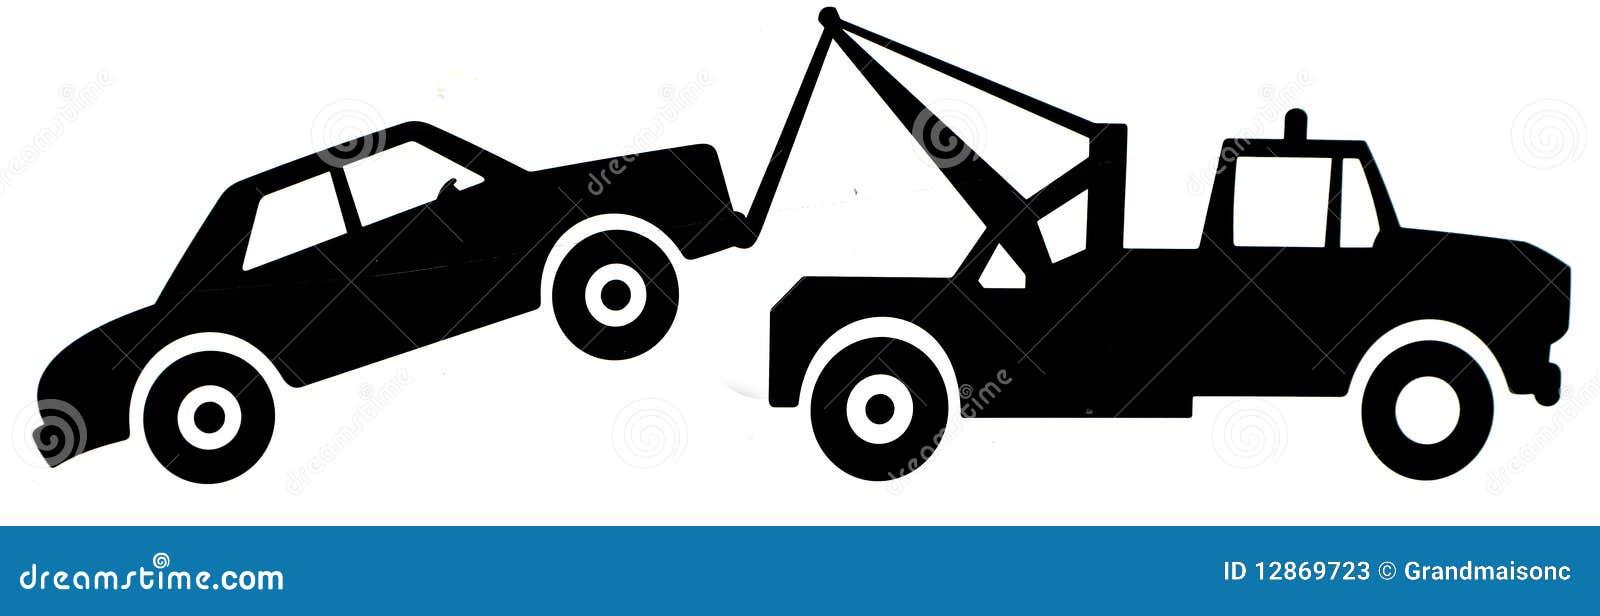 Tow Truck Sign Stock Photos - Image: 12869723